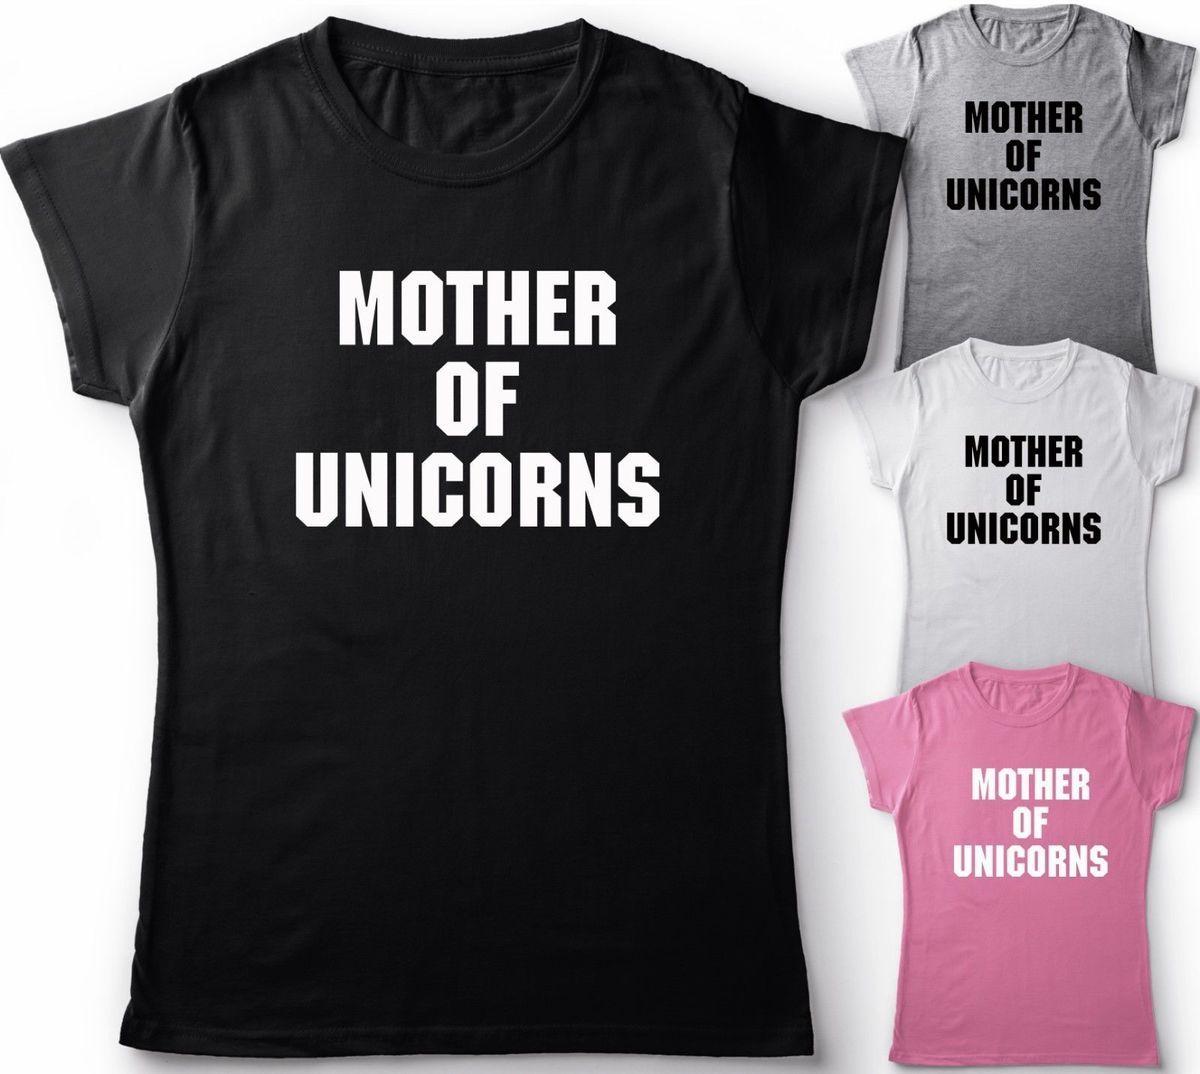 48612dc336 MOTHER OF UNICORNS FUNNY SLOGAN GIFT IDEA T SHIRT UNISEX/LADIES TOP Novelty  Cool Tops Men Short Sleeve Tshirt free shipping